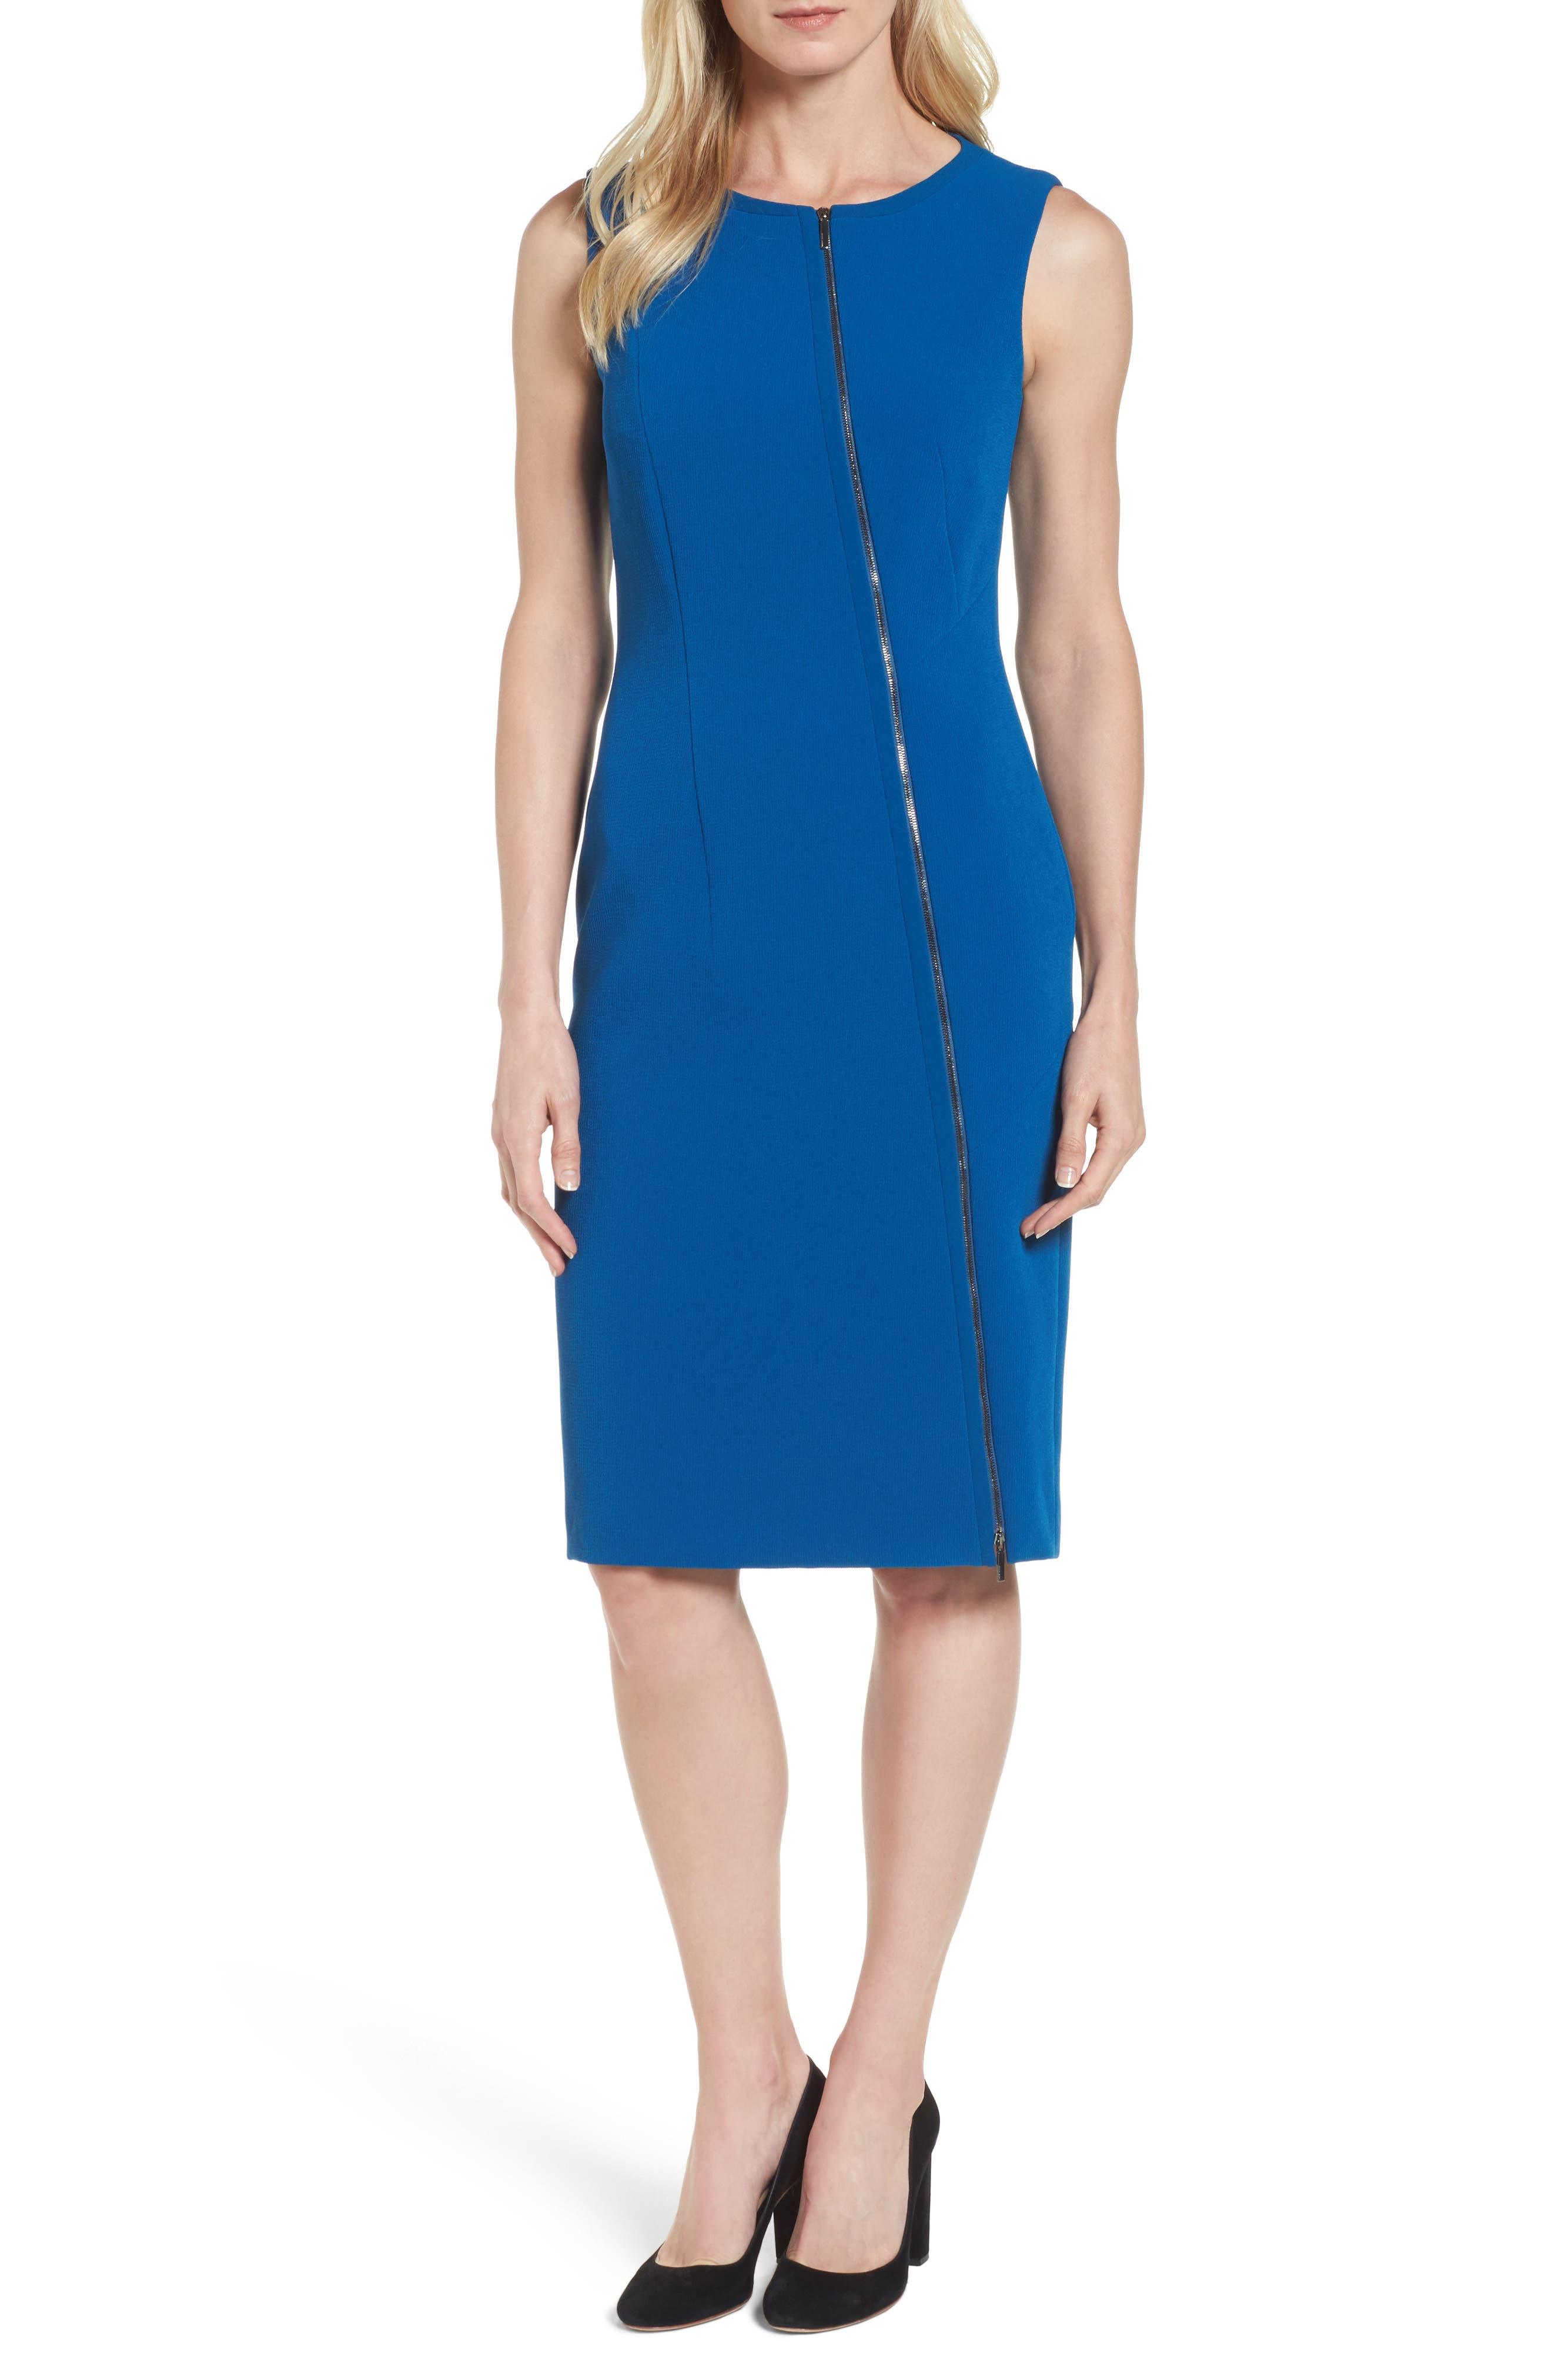 Danafea Zip Detail Sheath Dress,                             Main thumbnail 1, color,                             424